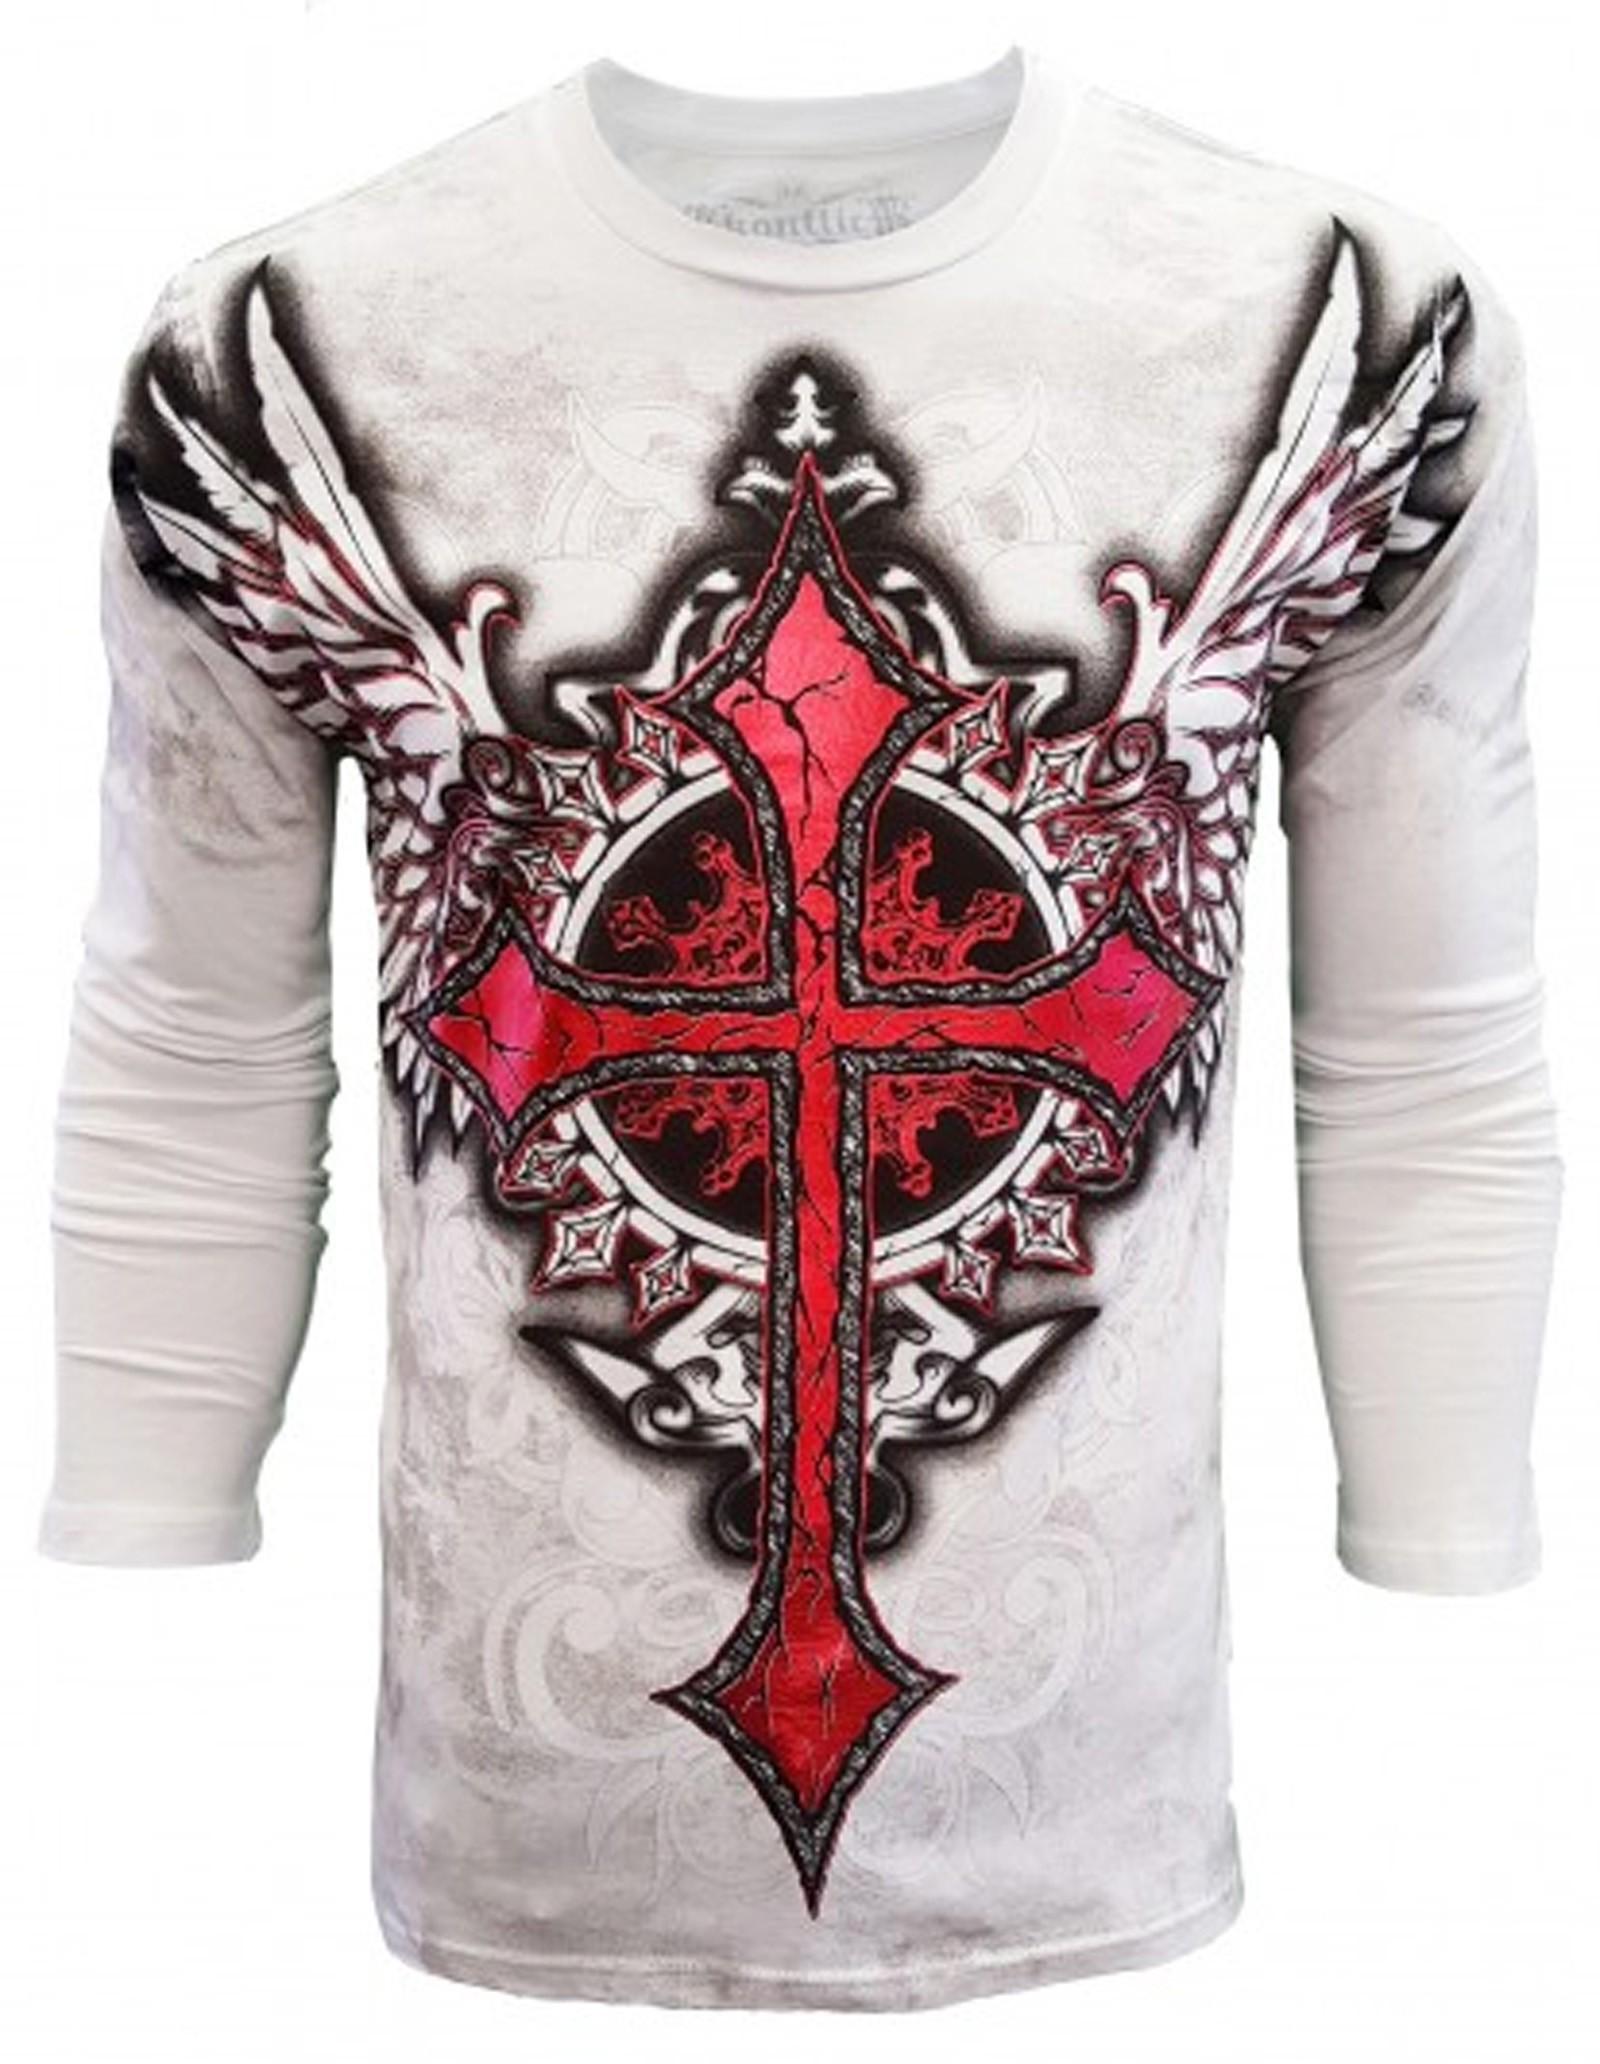 Konflic Clothing - Winged Cross Longsleeve T-Shirt